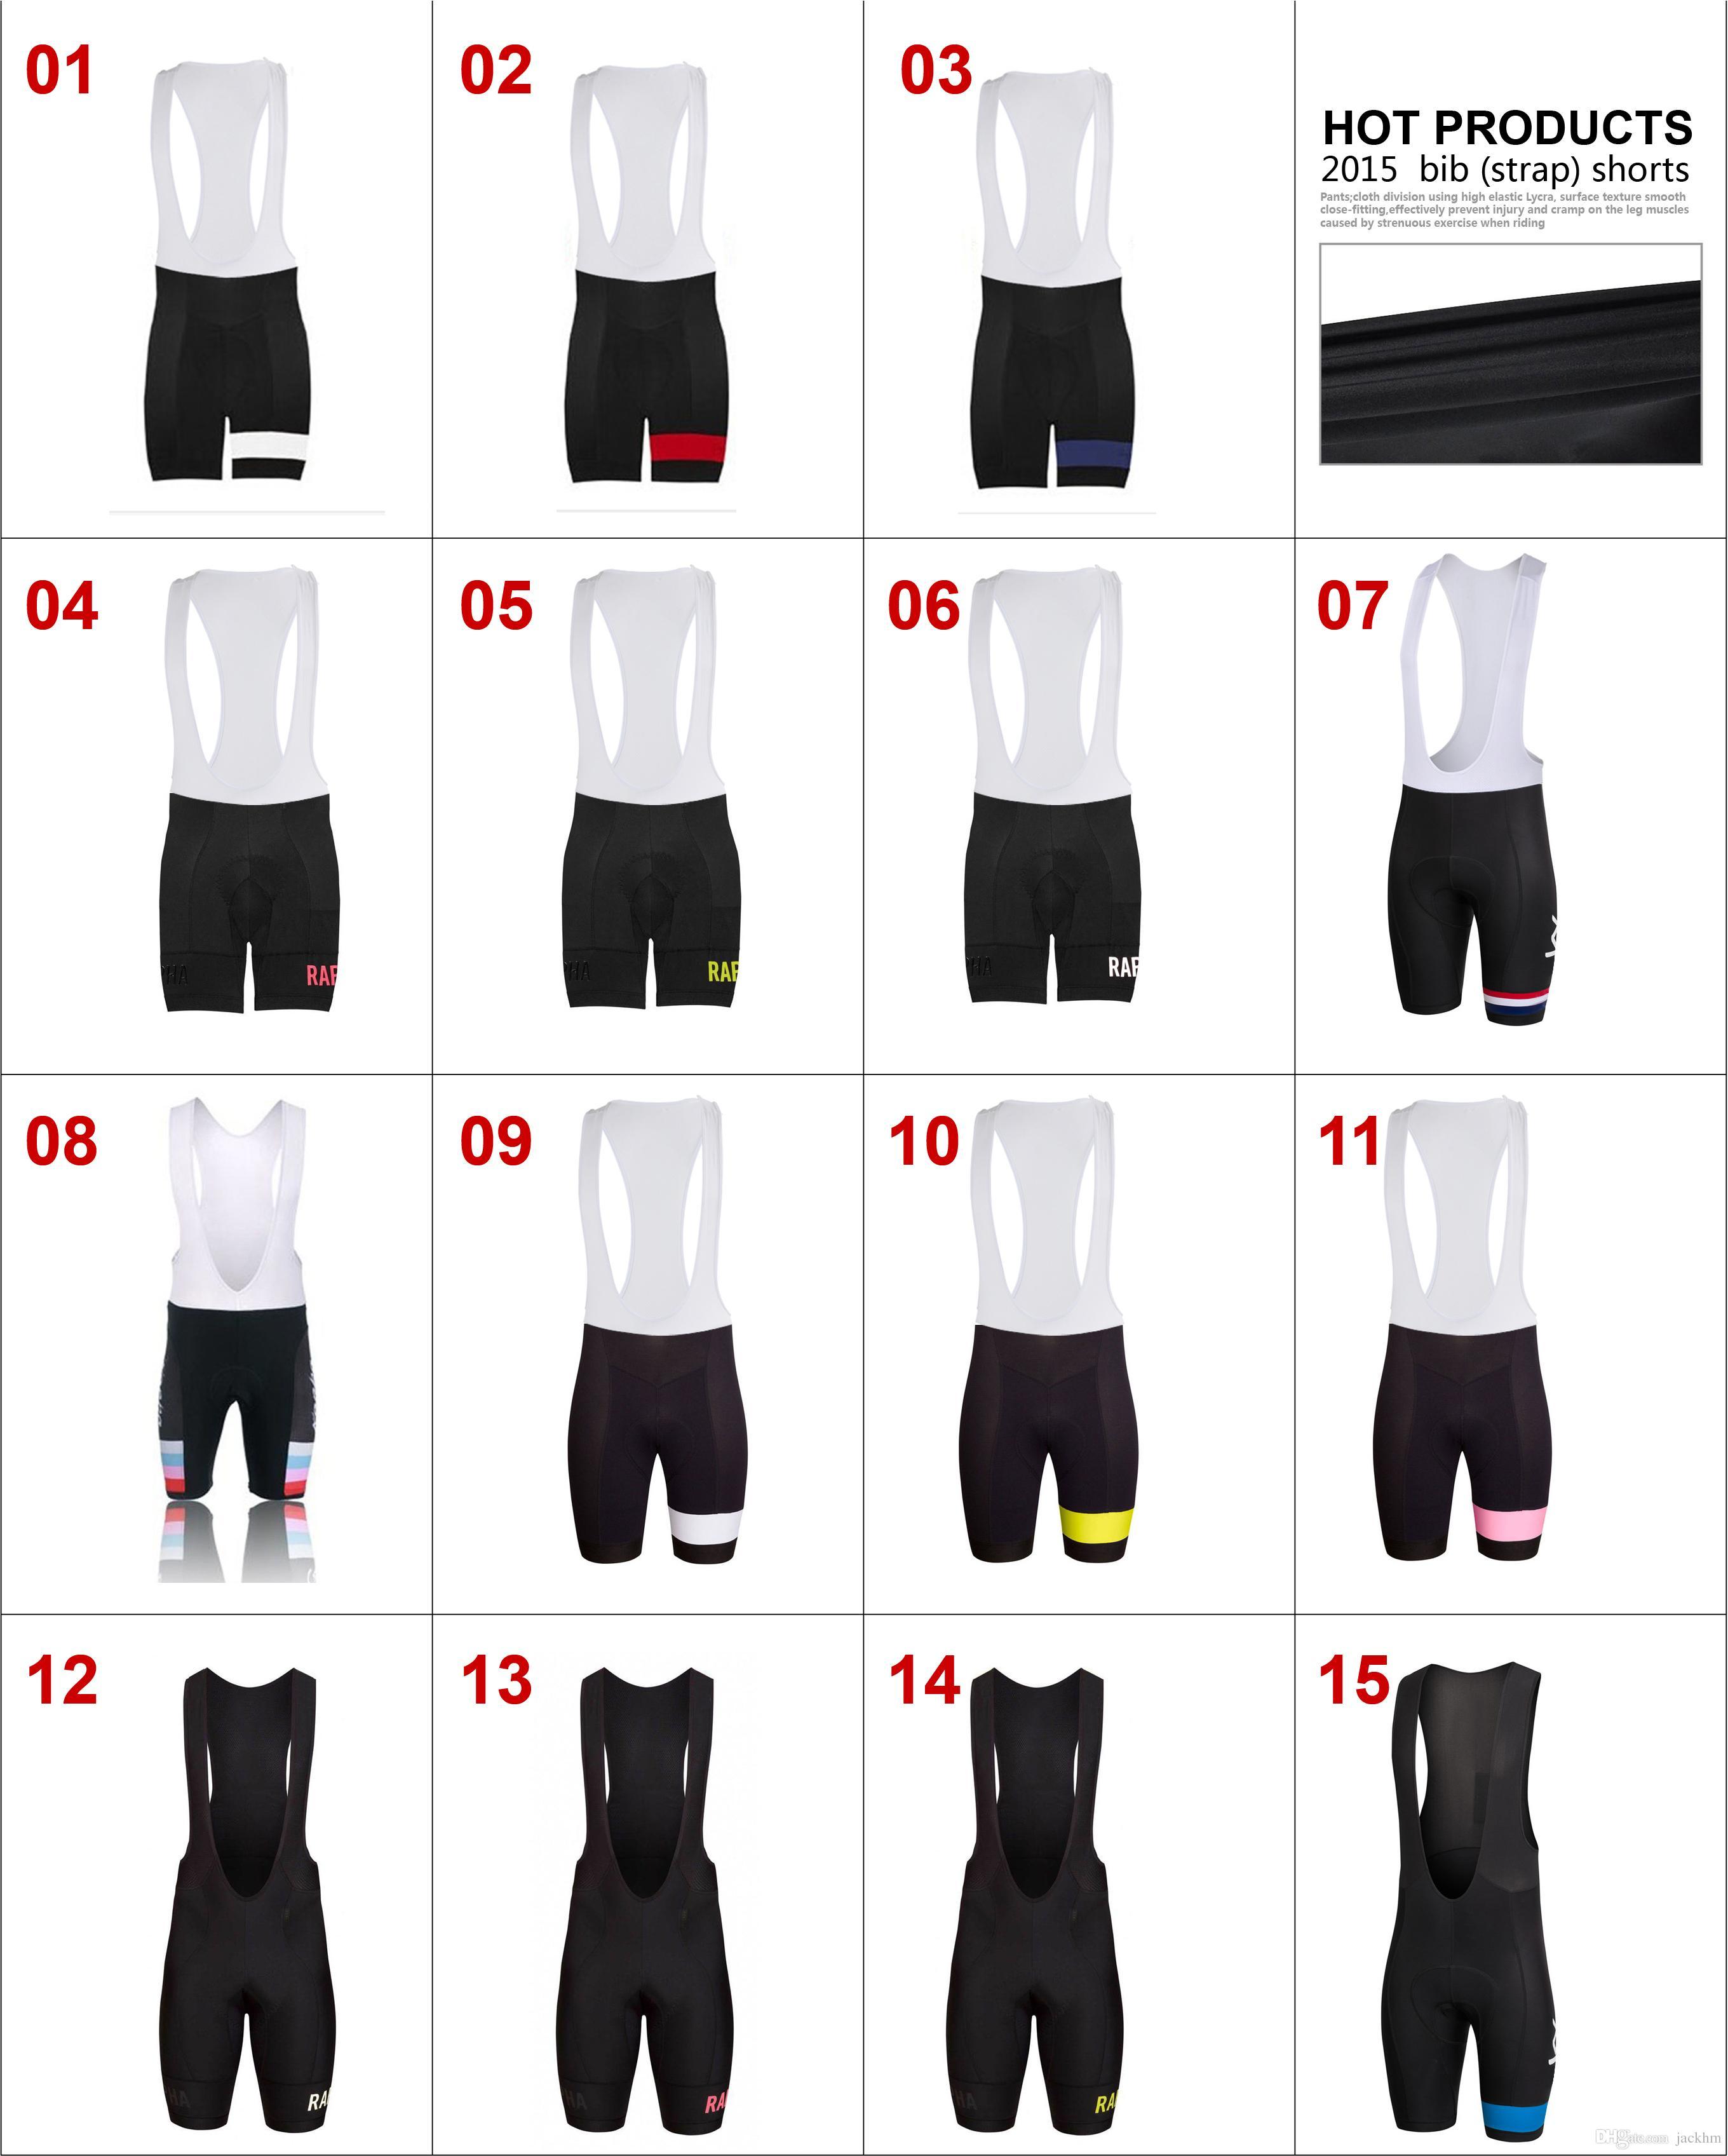 95656f8ab Hot Products 2018 Rafa Black Sports Clothing Strap Shorts   Pro Team Cycling  Bib Shorts   Bicycle Mountain Riding Bib Shorts   Sports Clothe Hot  Products ...